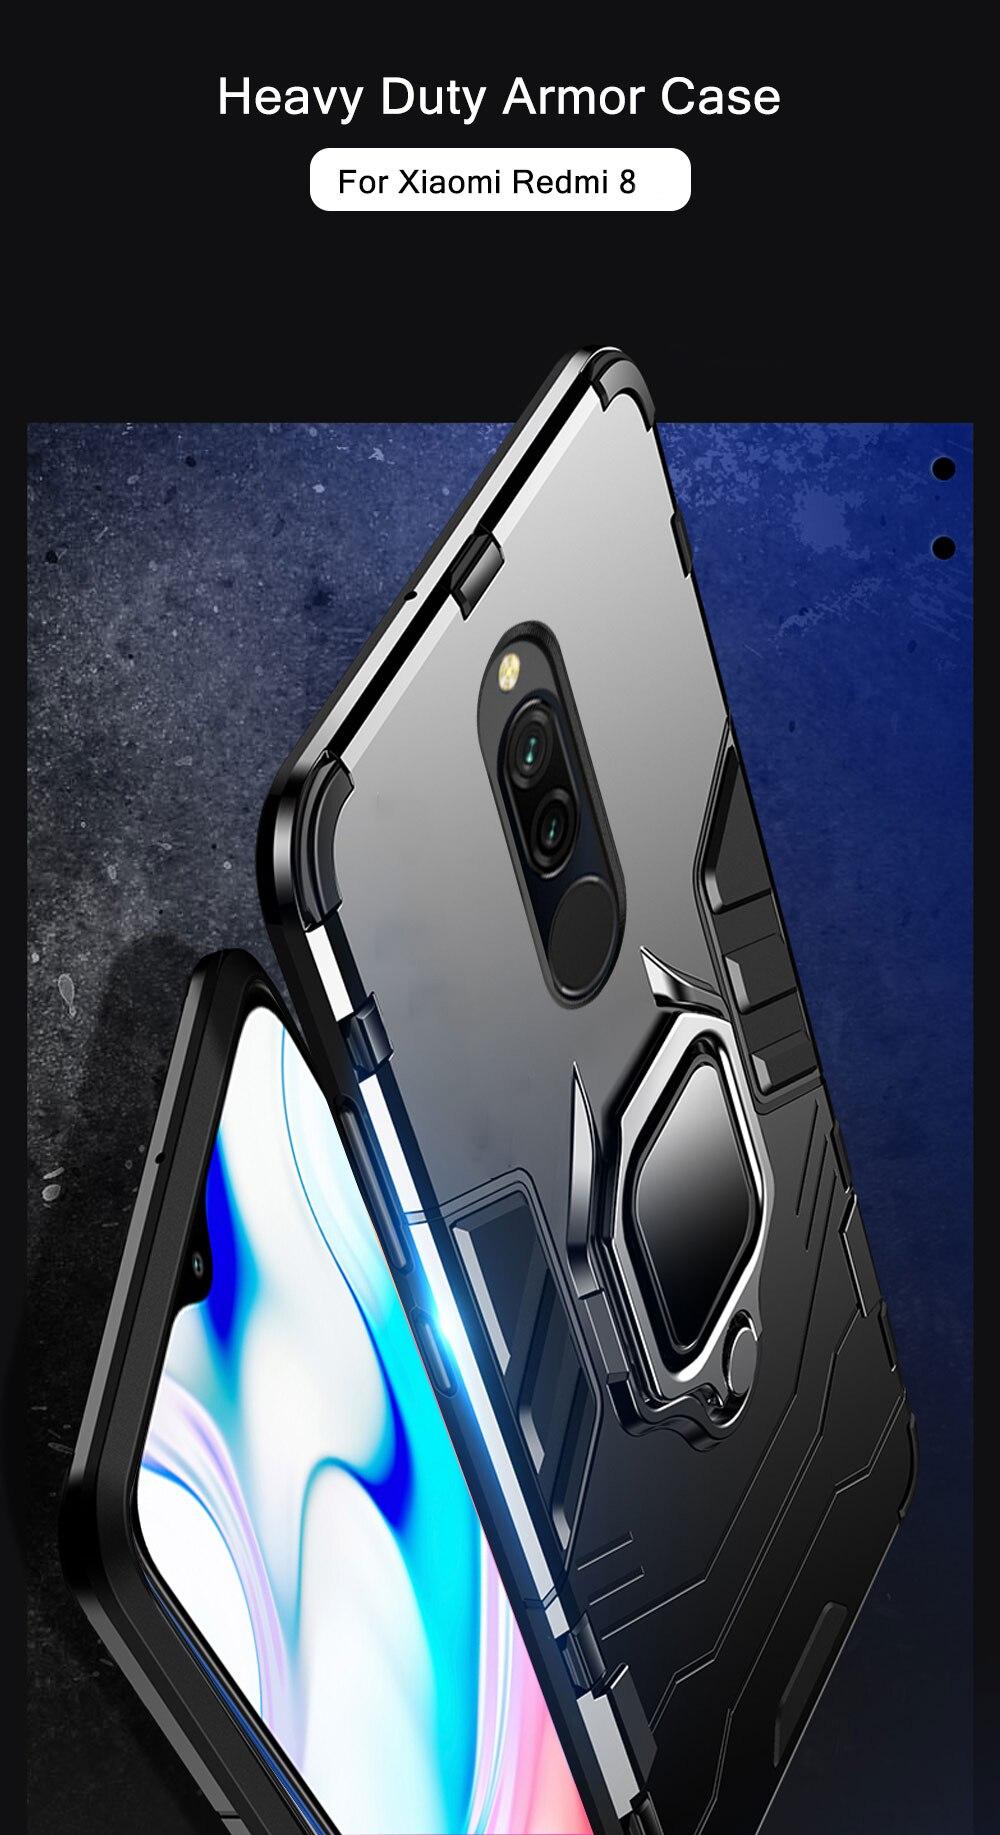 H303d63ad49464cfaae11ea693a6a52865 Armor Case for Redmi 8 8A Case Magnetic Car Phone Holder TPU+PC Bumper Cover on for Xiaomi Redmi 8 8A 8 A Global Version Case